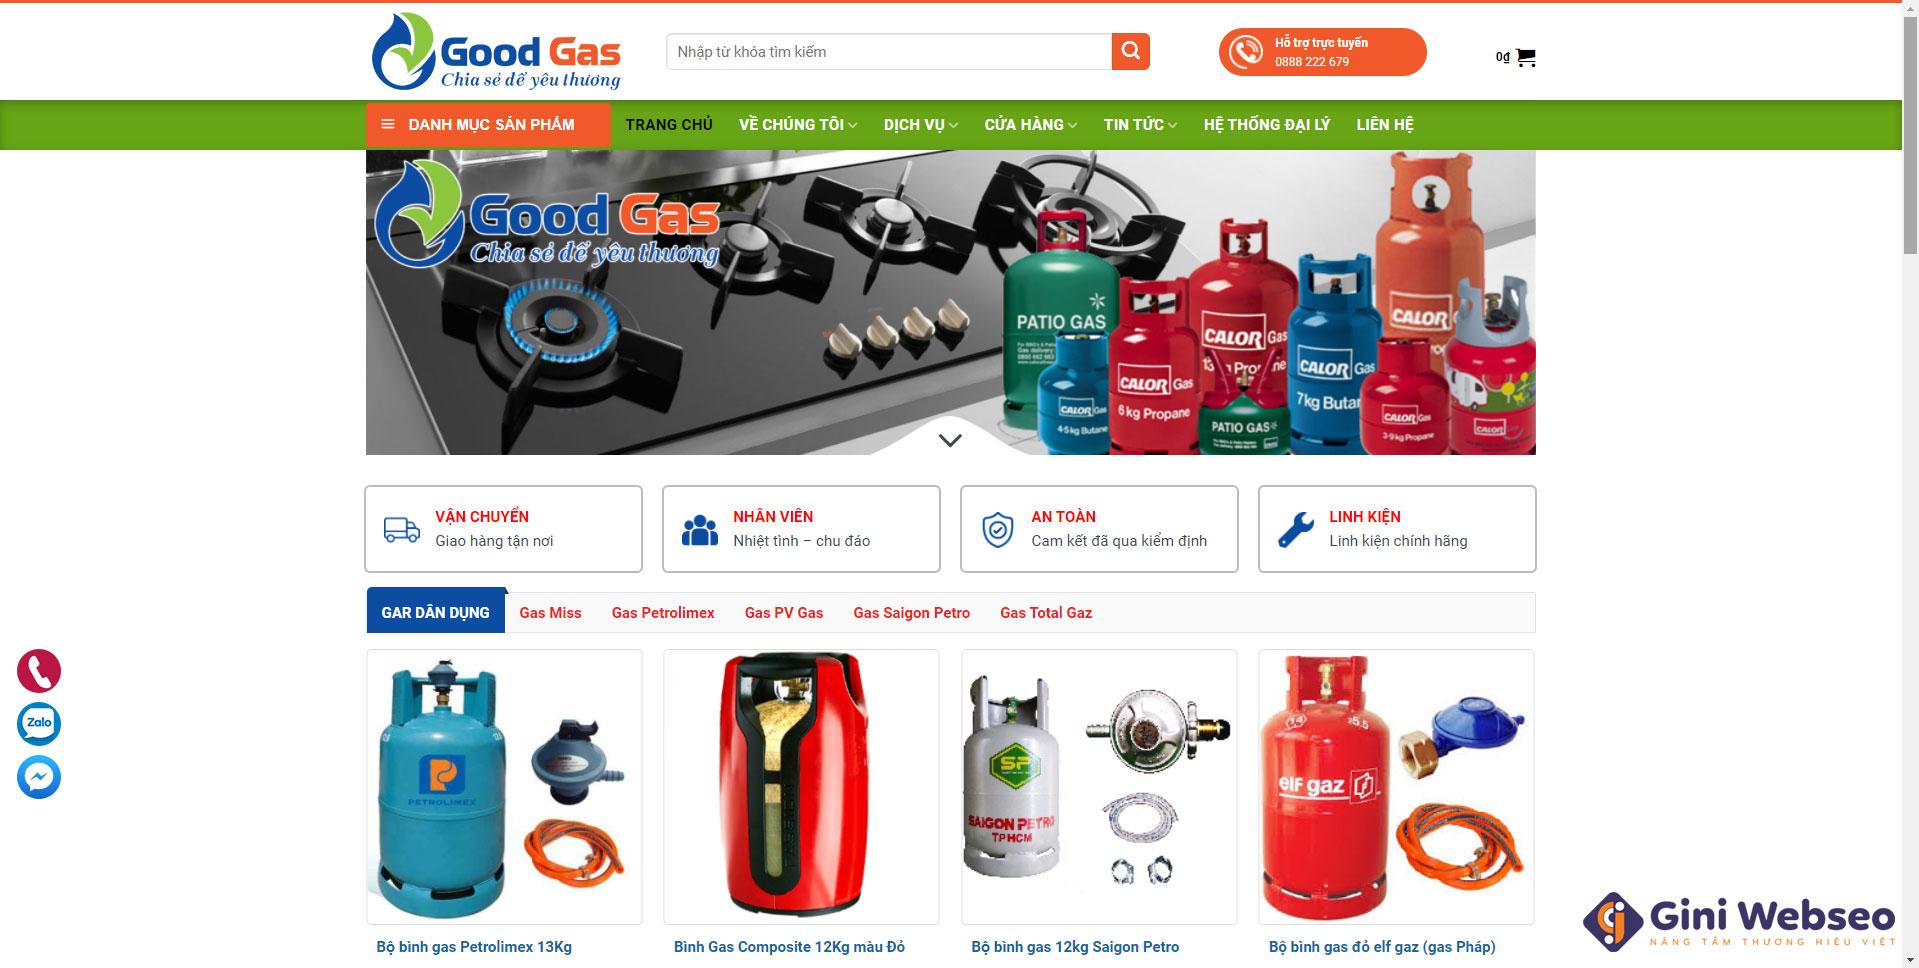 Thiết kế website bán gas Good Gas